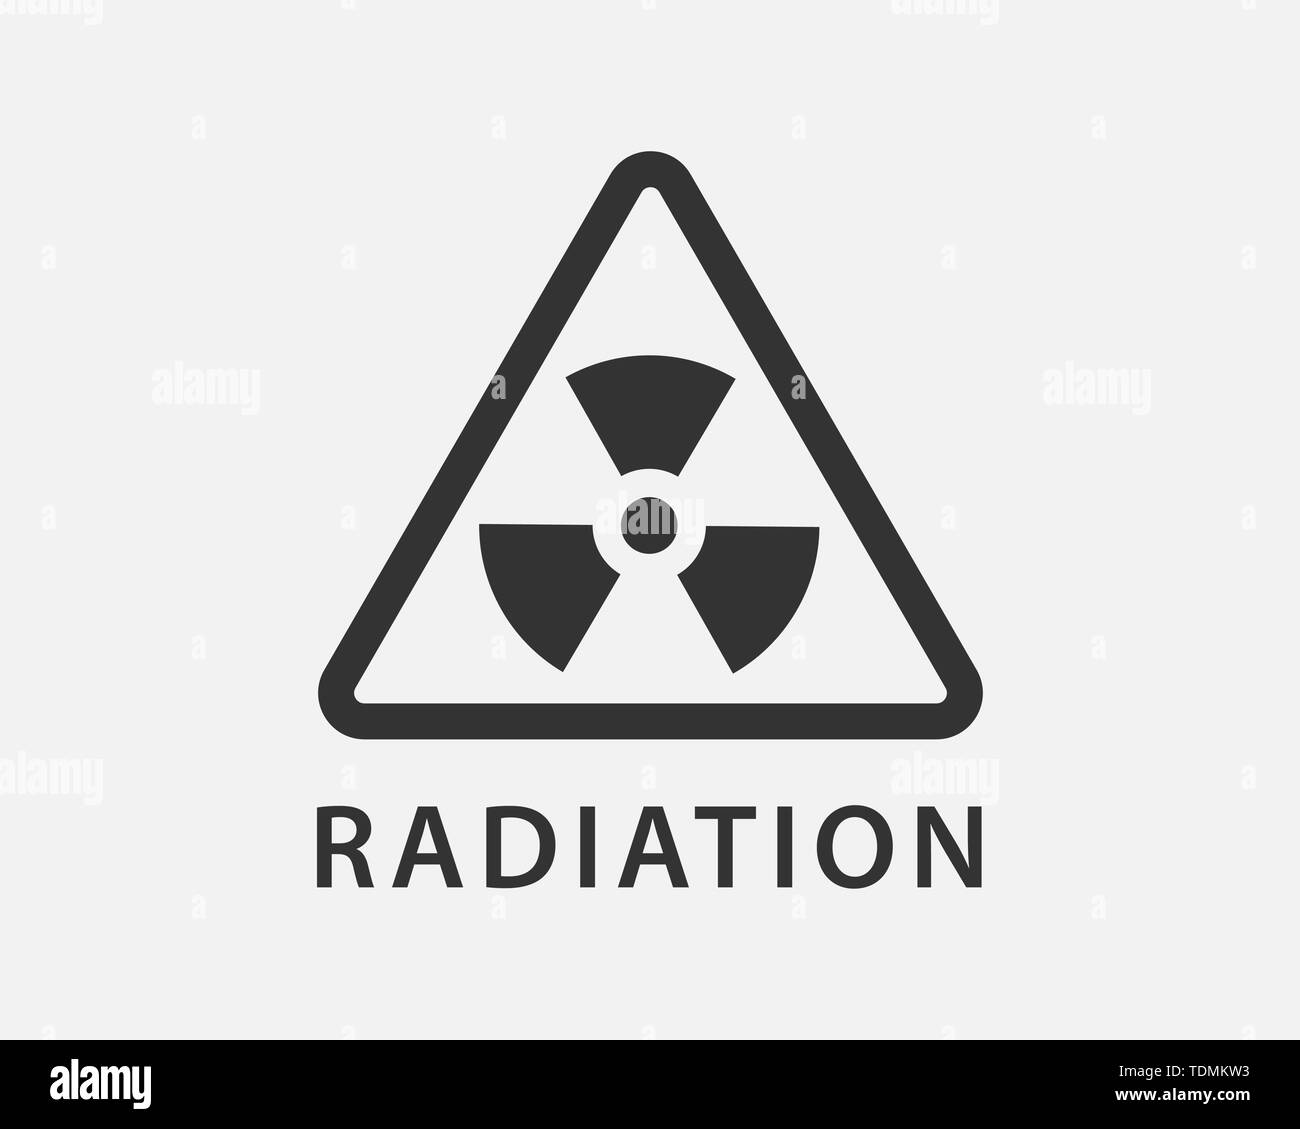 Radiation icon vector. Warning radioactive sign danger symbol. - Stock Vector